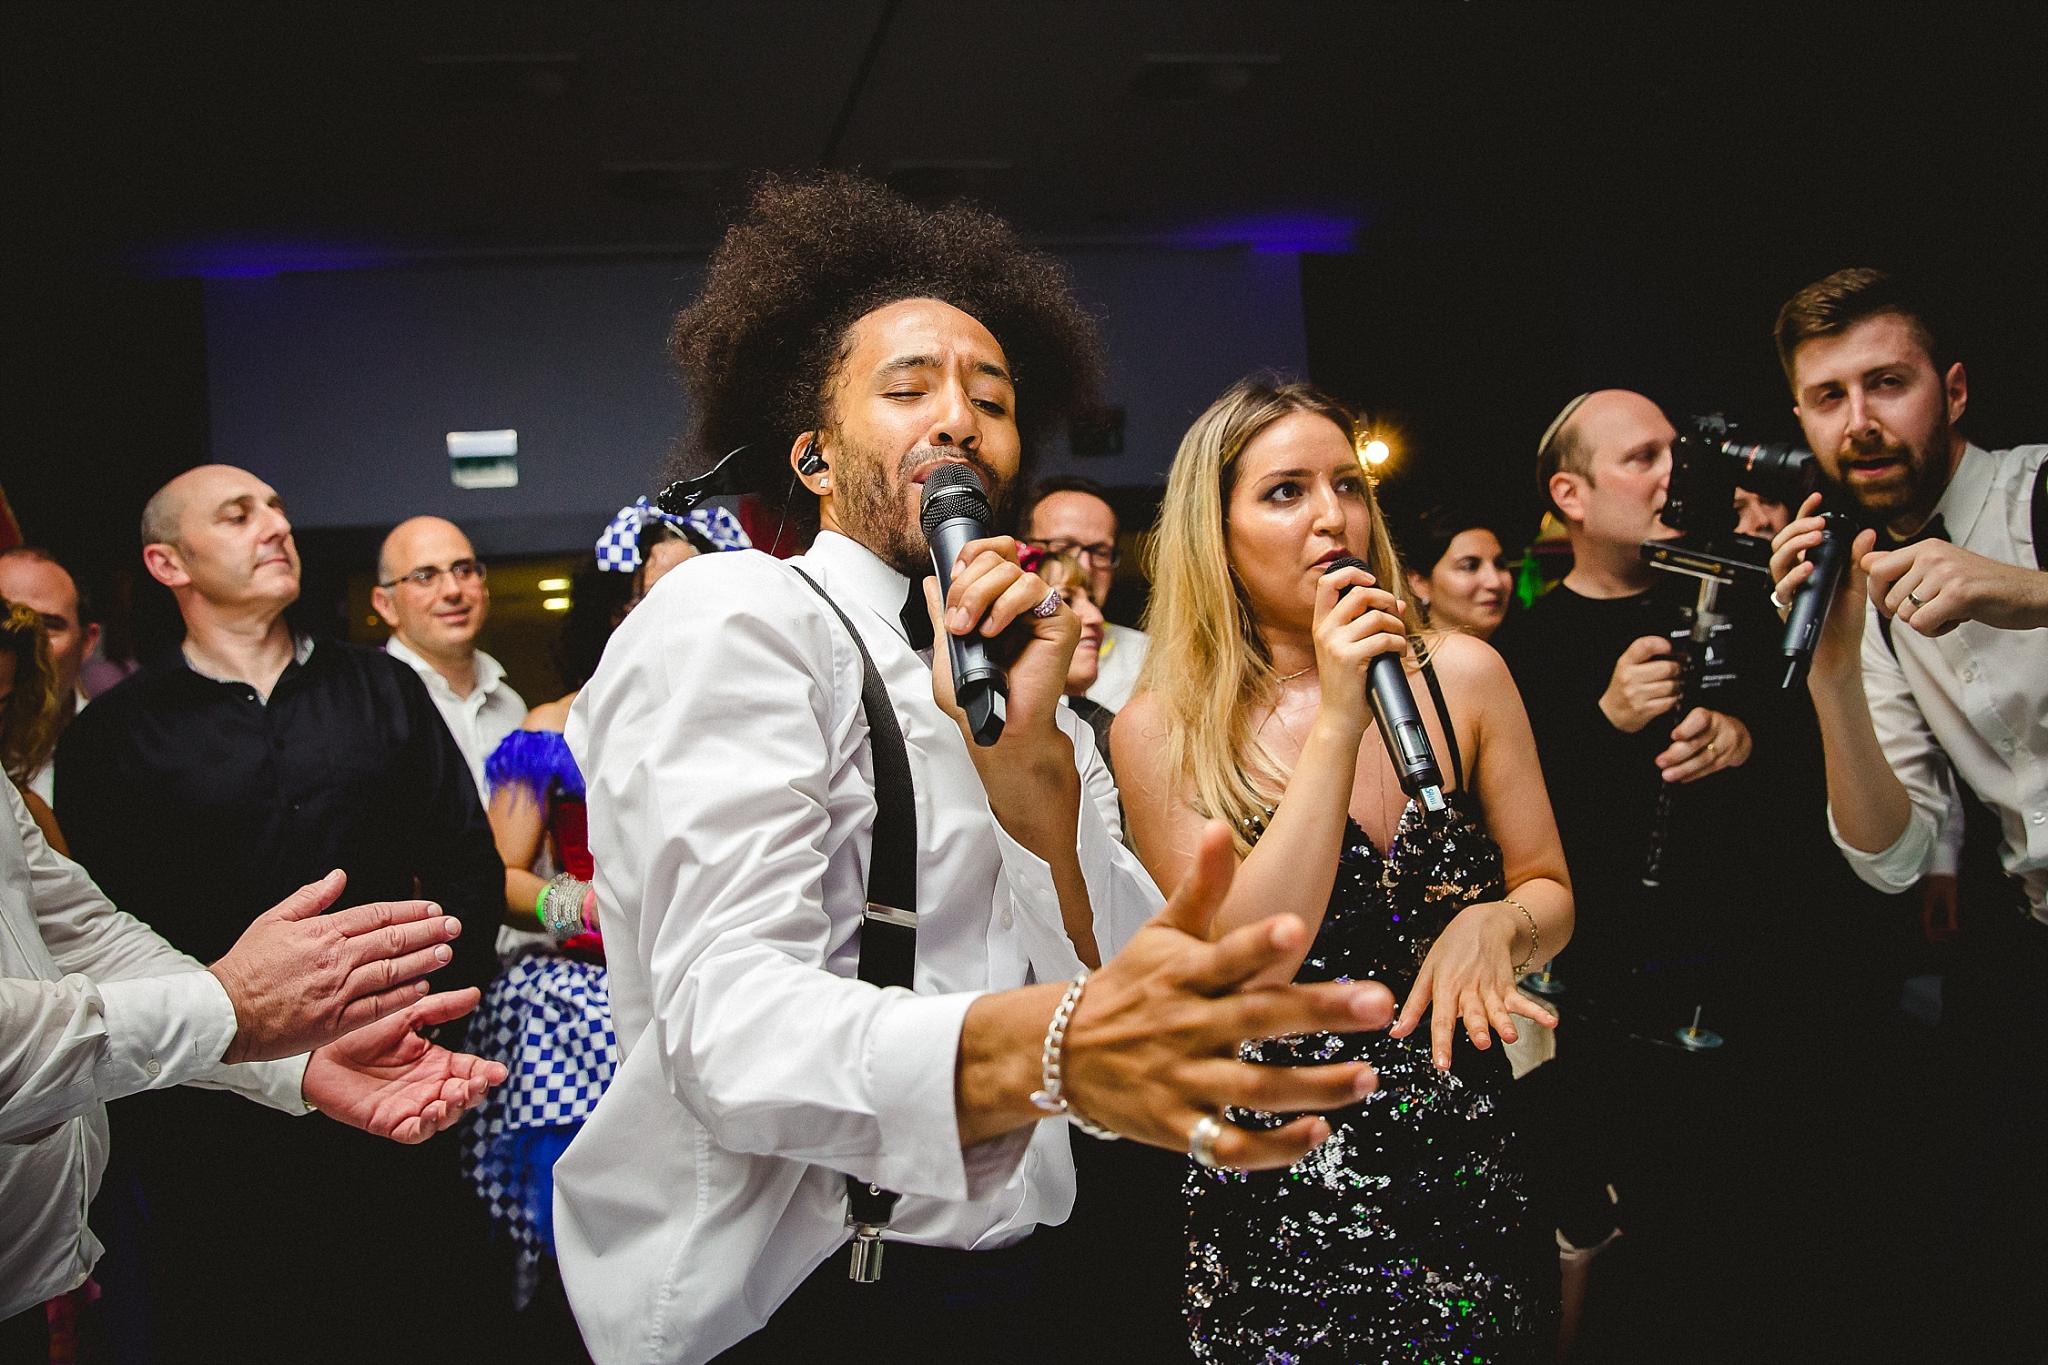 Music - Choir - Get GospelLive Band - The Function BandLive Band - Three Mile HillSinger & DJ - Aaron HardingDJ, Lighting & Dancefloor - Lovelight EntertainmentPianist & Singer - Danny Mills